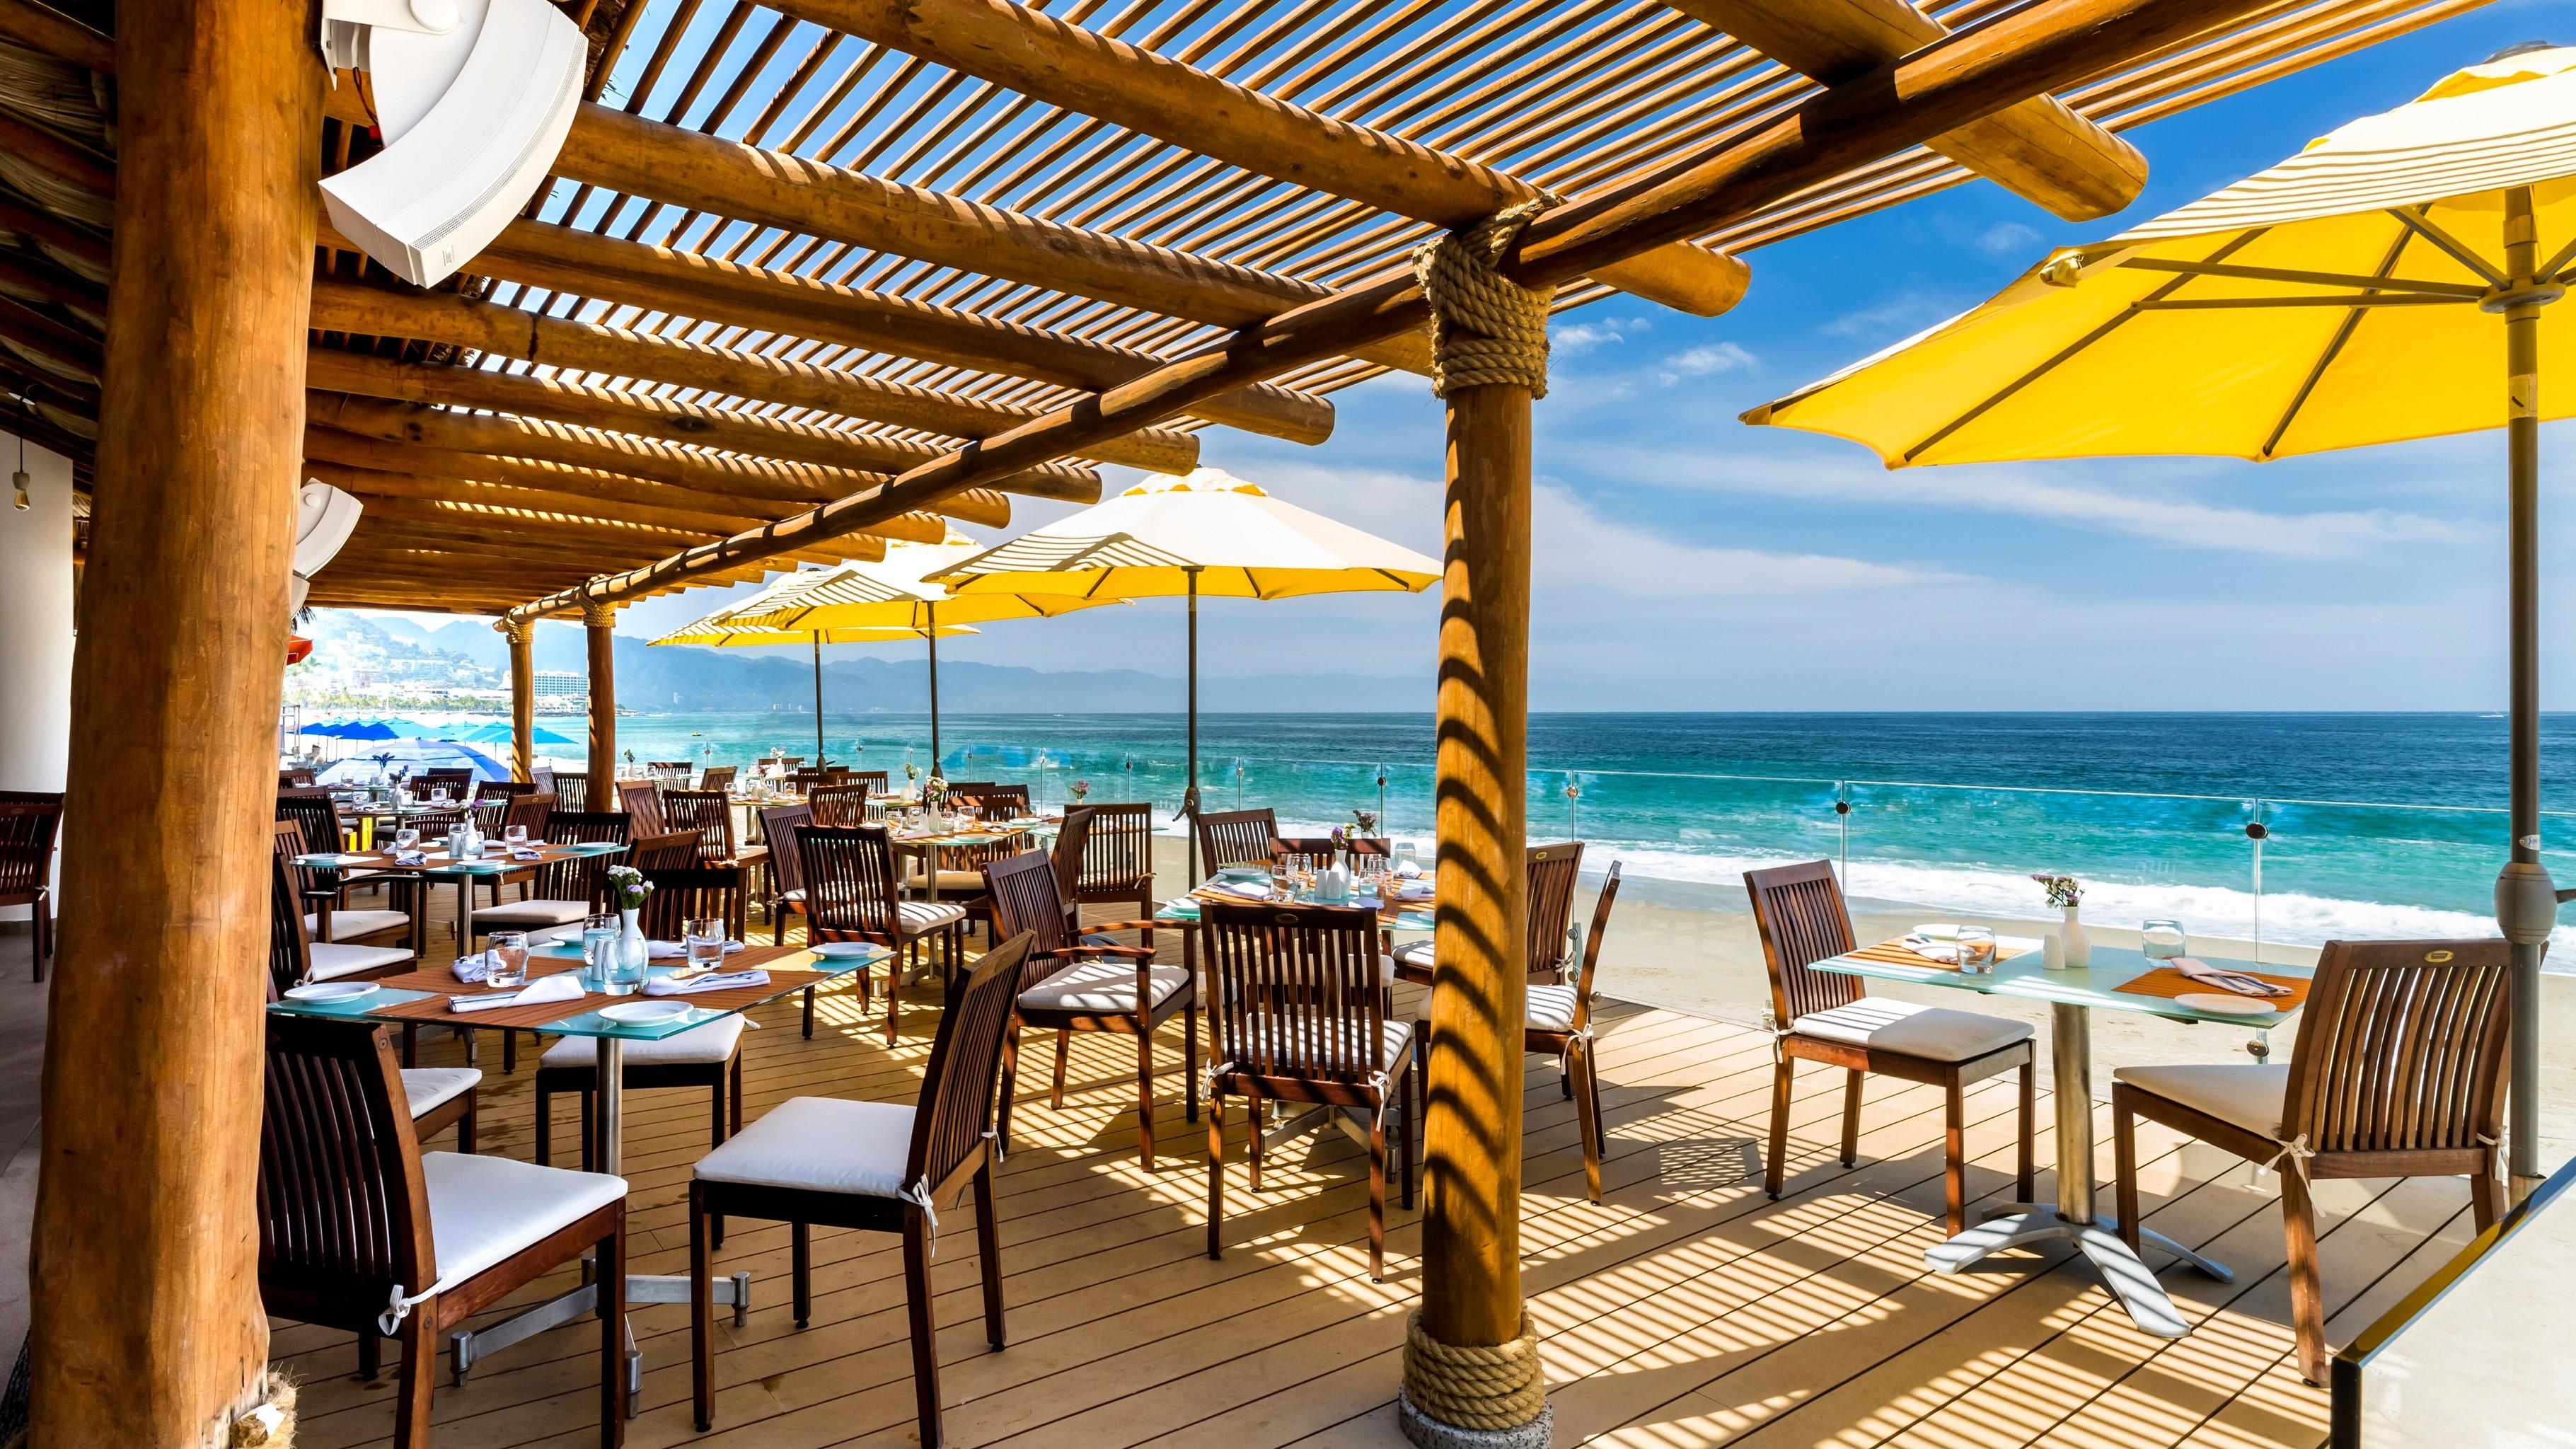 Buenaventura Grand Hotel Great Moments Puerto Vallarta Ja Mexiko Die Gunstigen Angebote